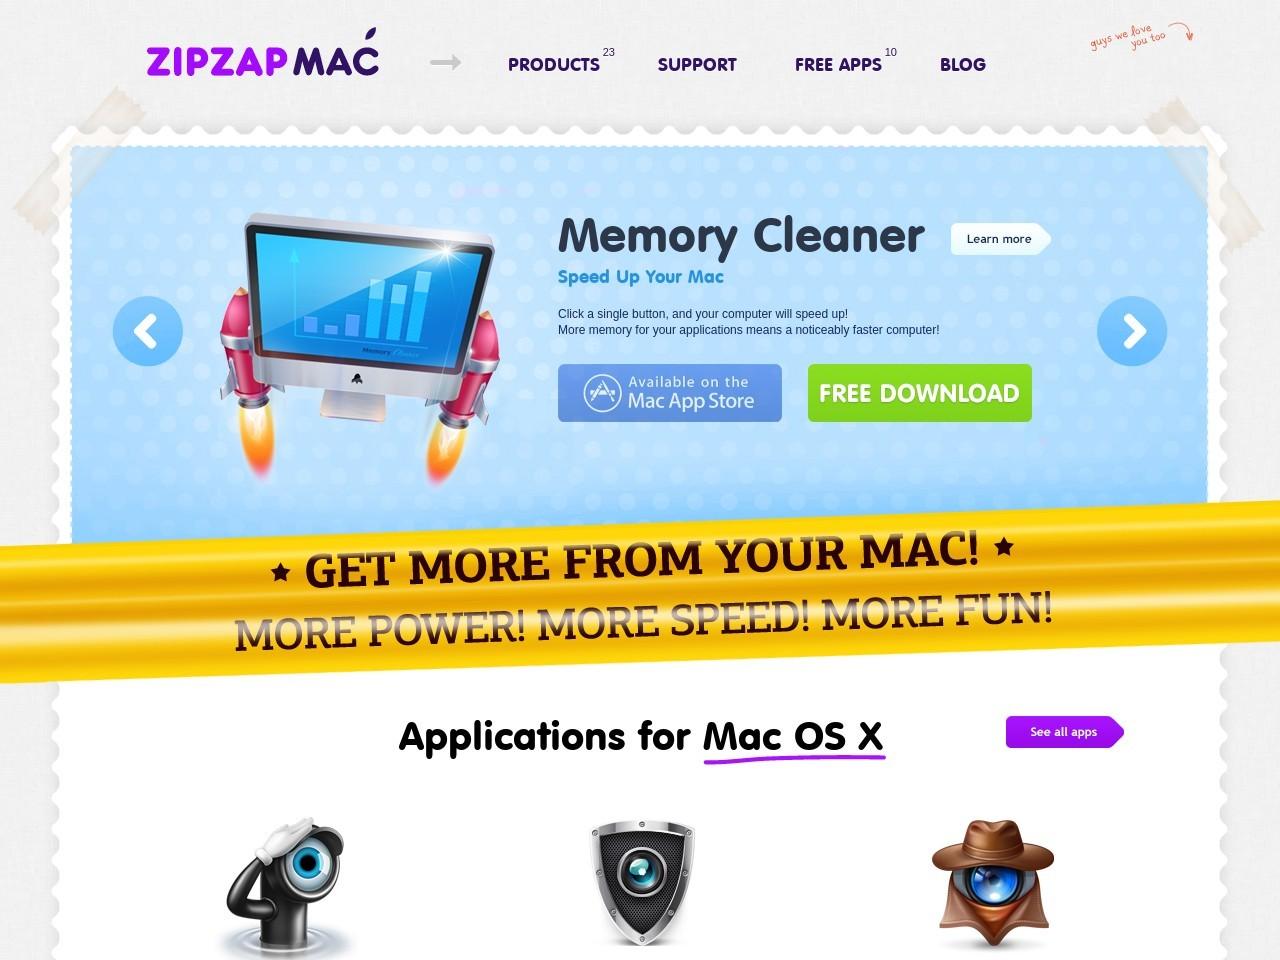 ZipZapMac